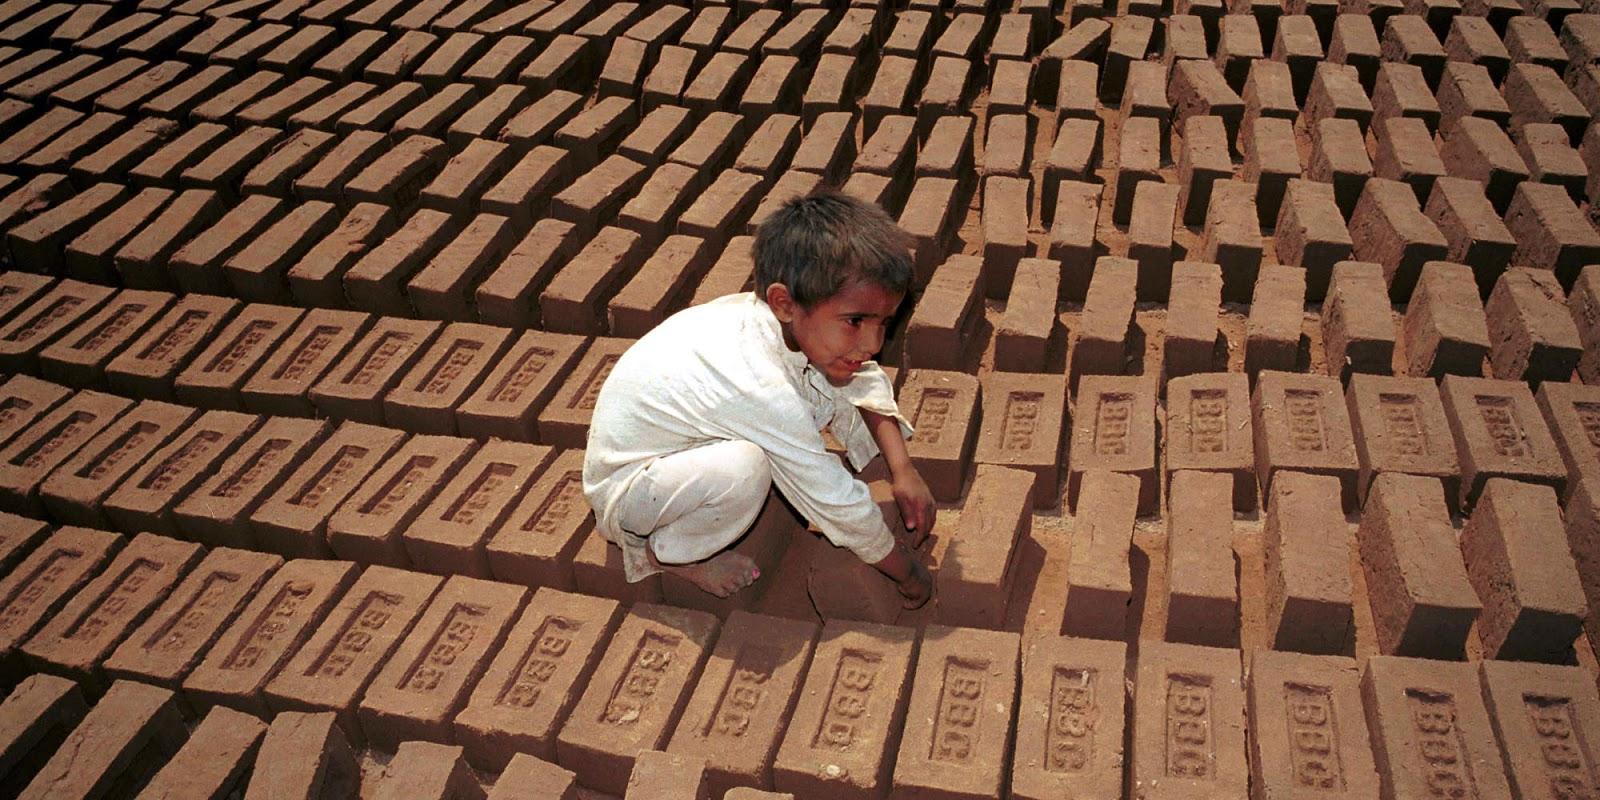 child labor in pakistan essay